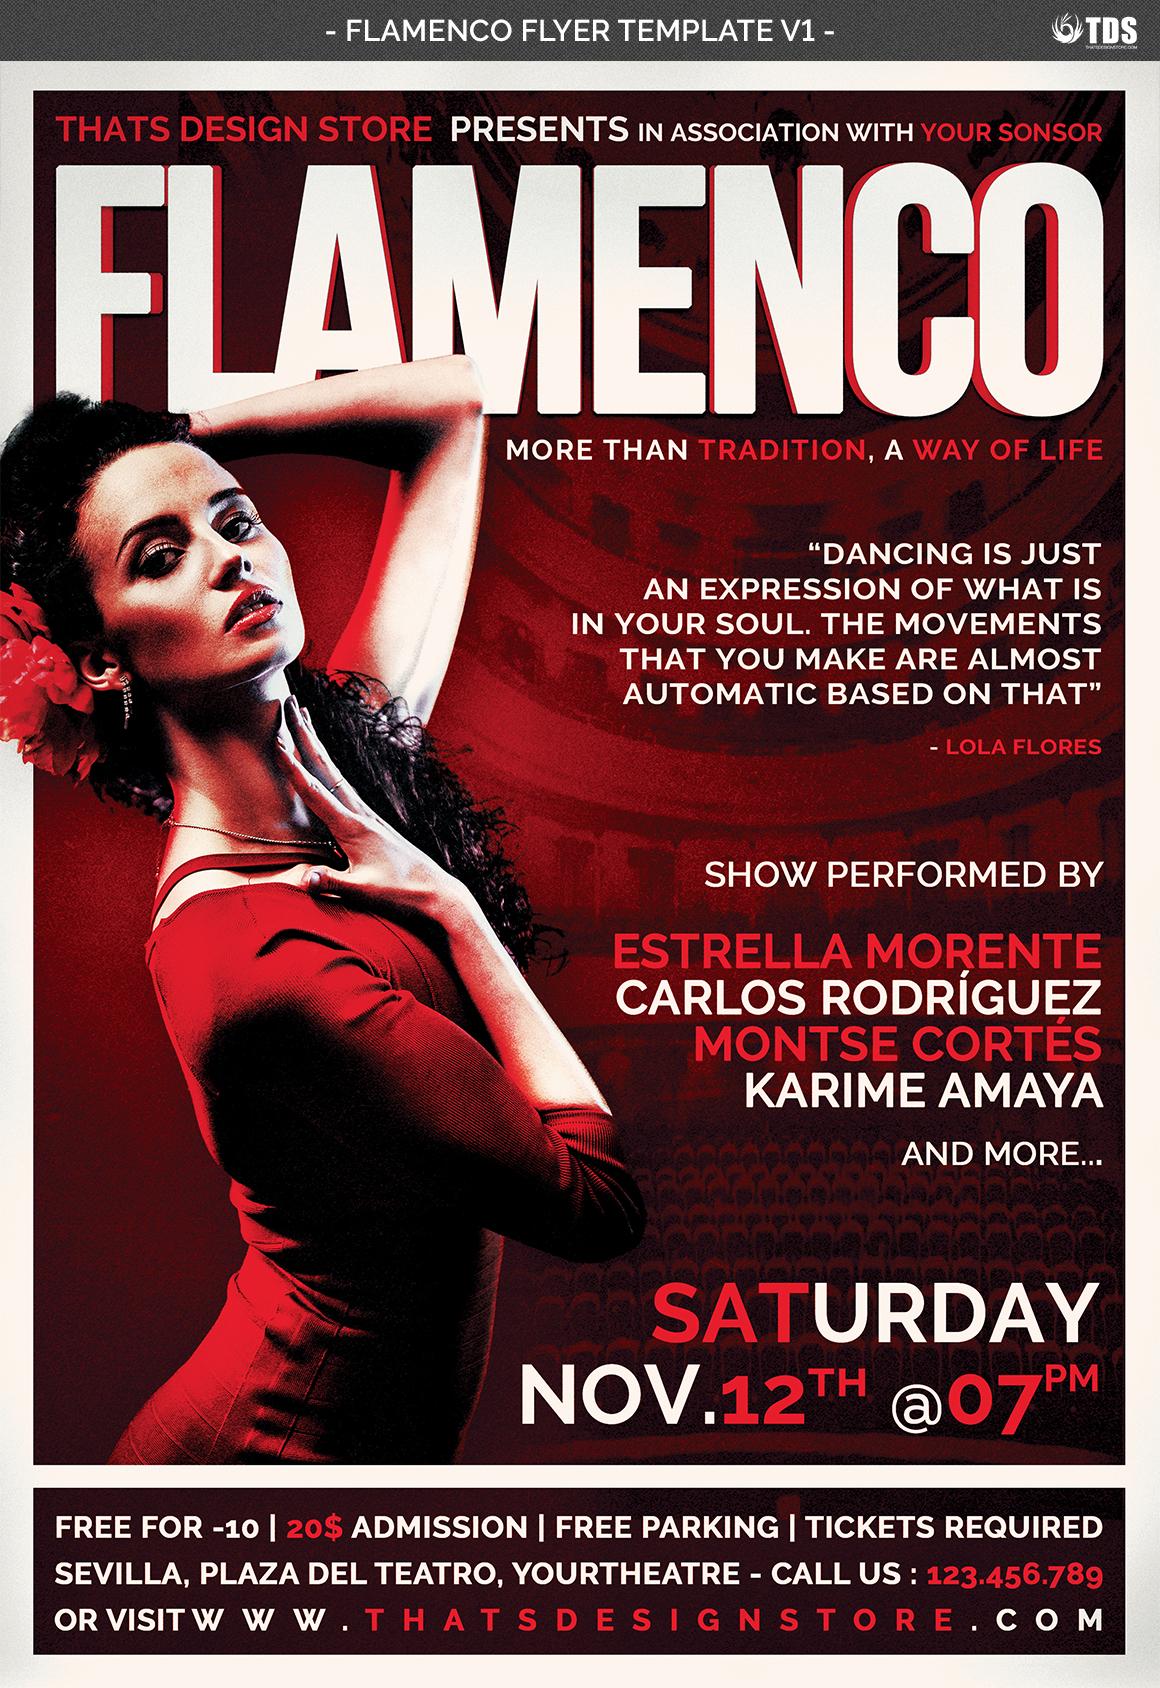 Flamenco Flyer Template V1 example image 5